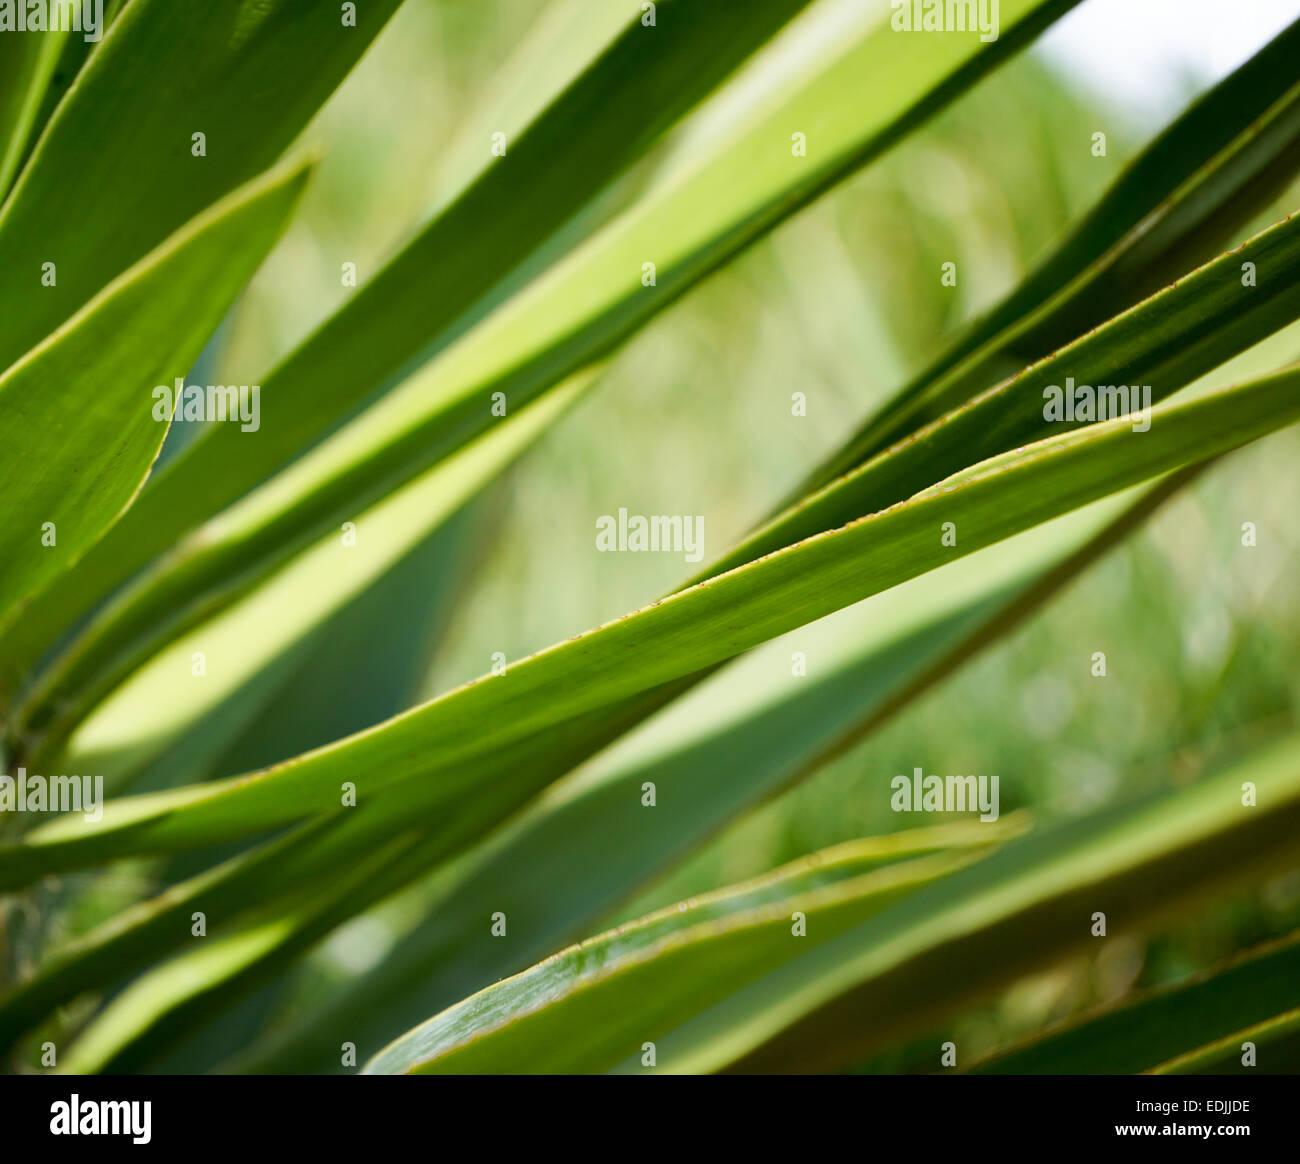 Grüne Pflanze in nachhaltige Garten. Stockbild